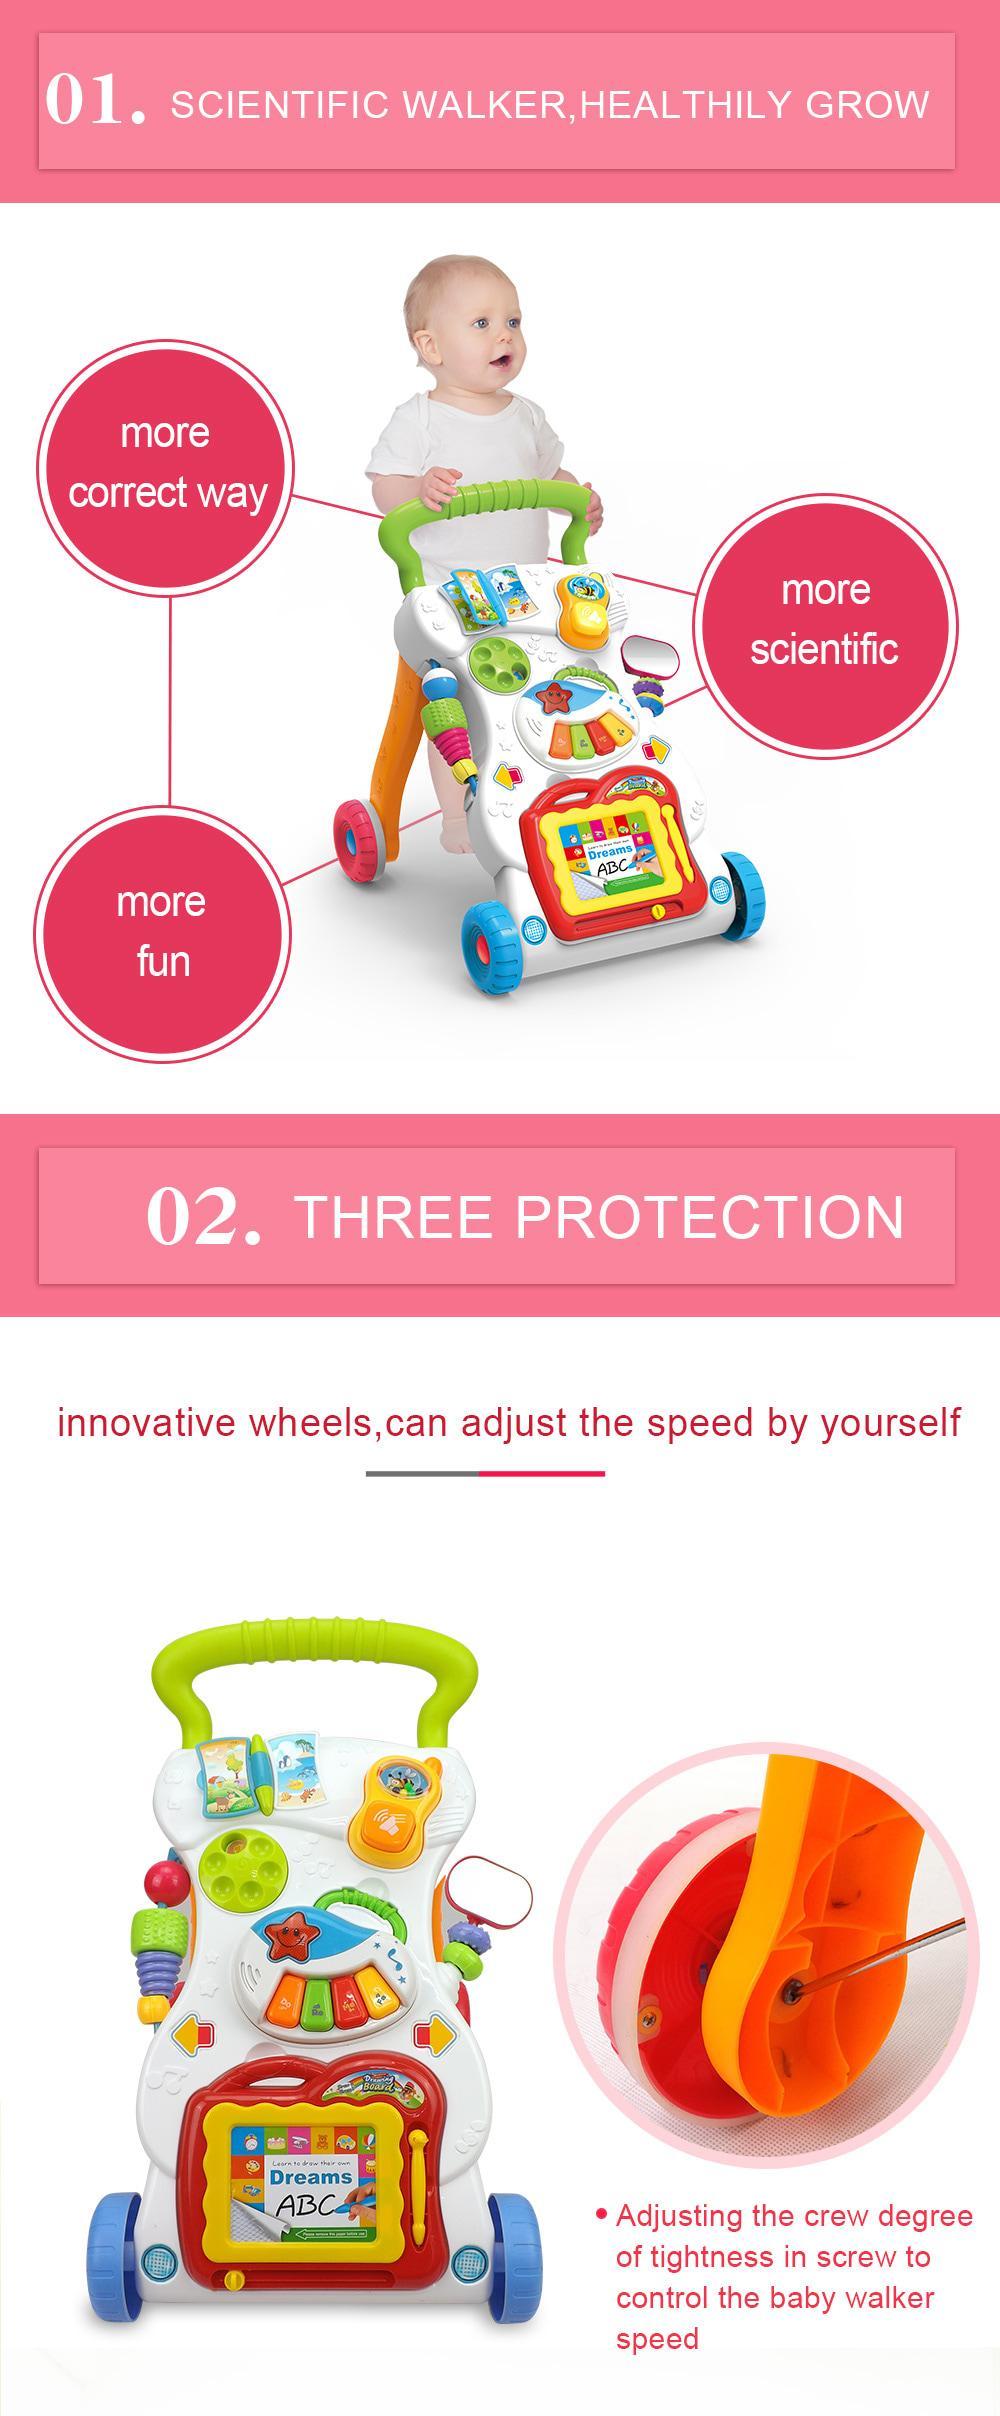 Kelebihan Baby Walker Stroller Alat Bantu Bayi Belajar Berjalan Push Musical Jalan 4